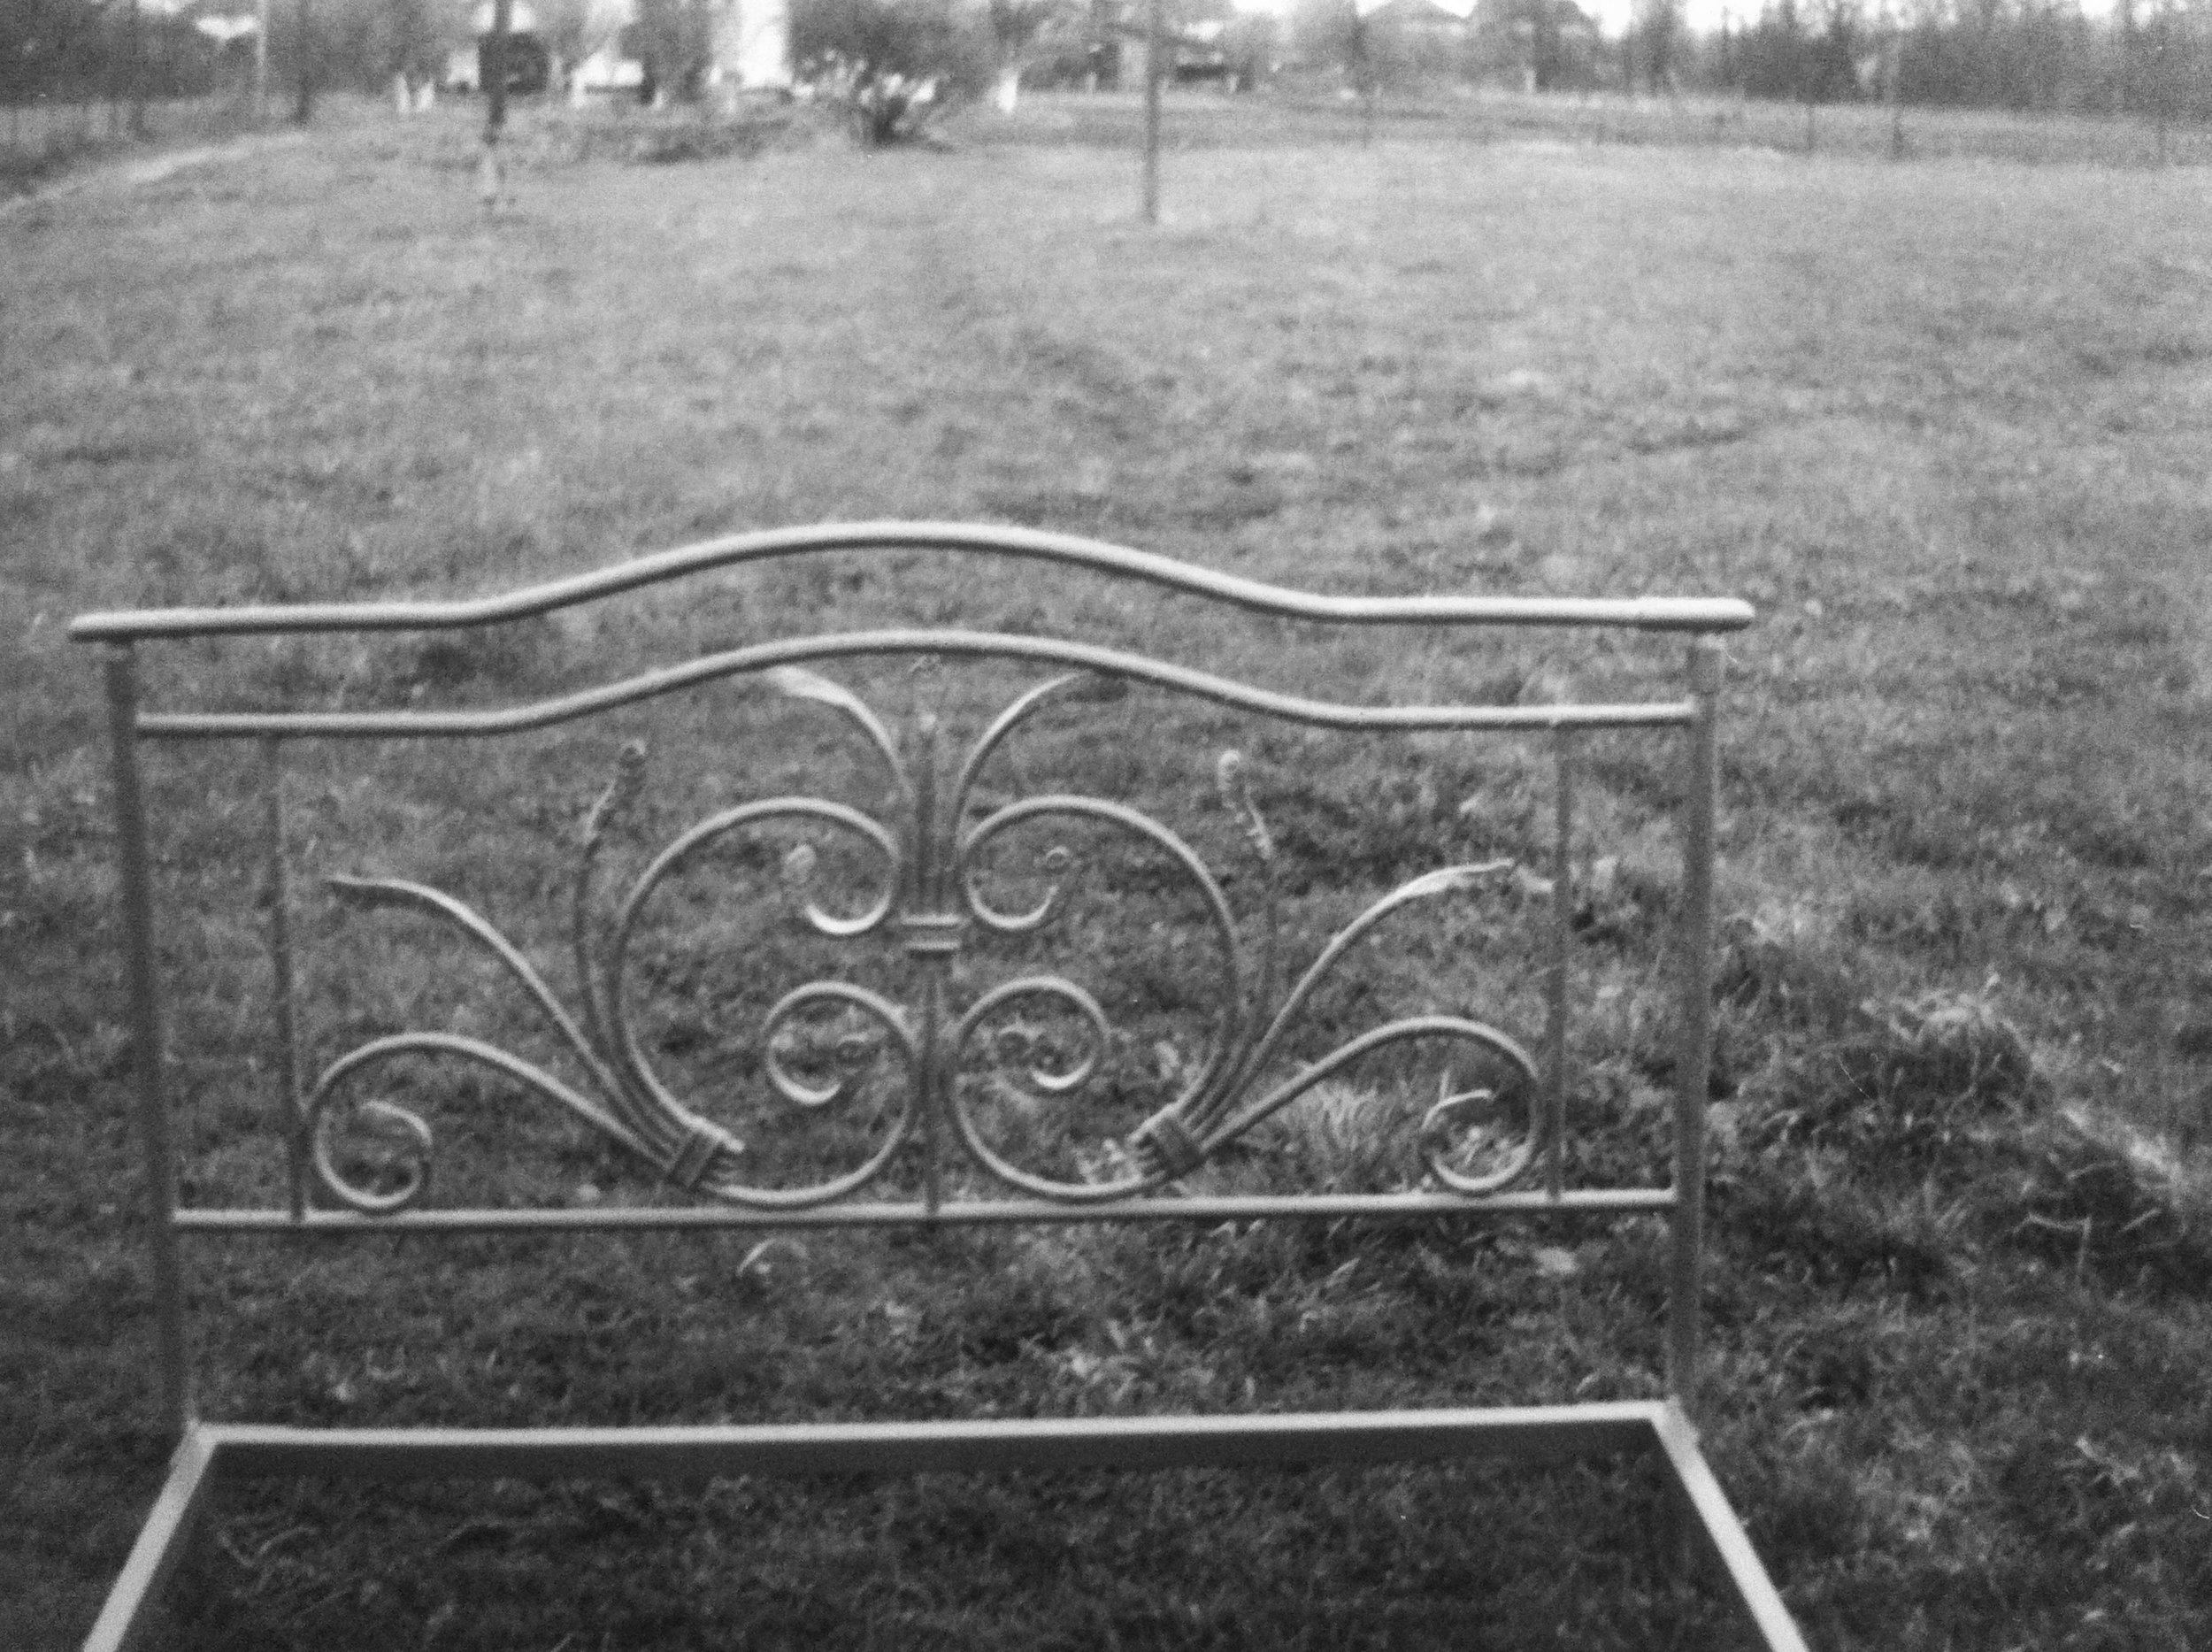 krevet kovano gvozdje - wrought iron bed